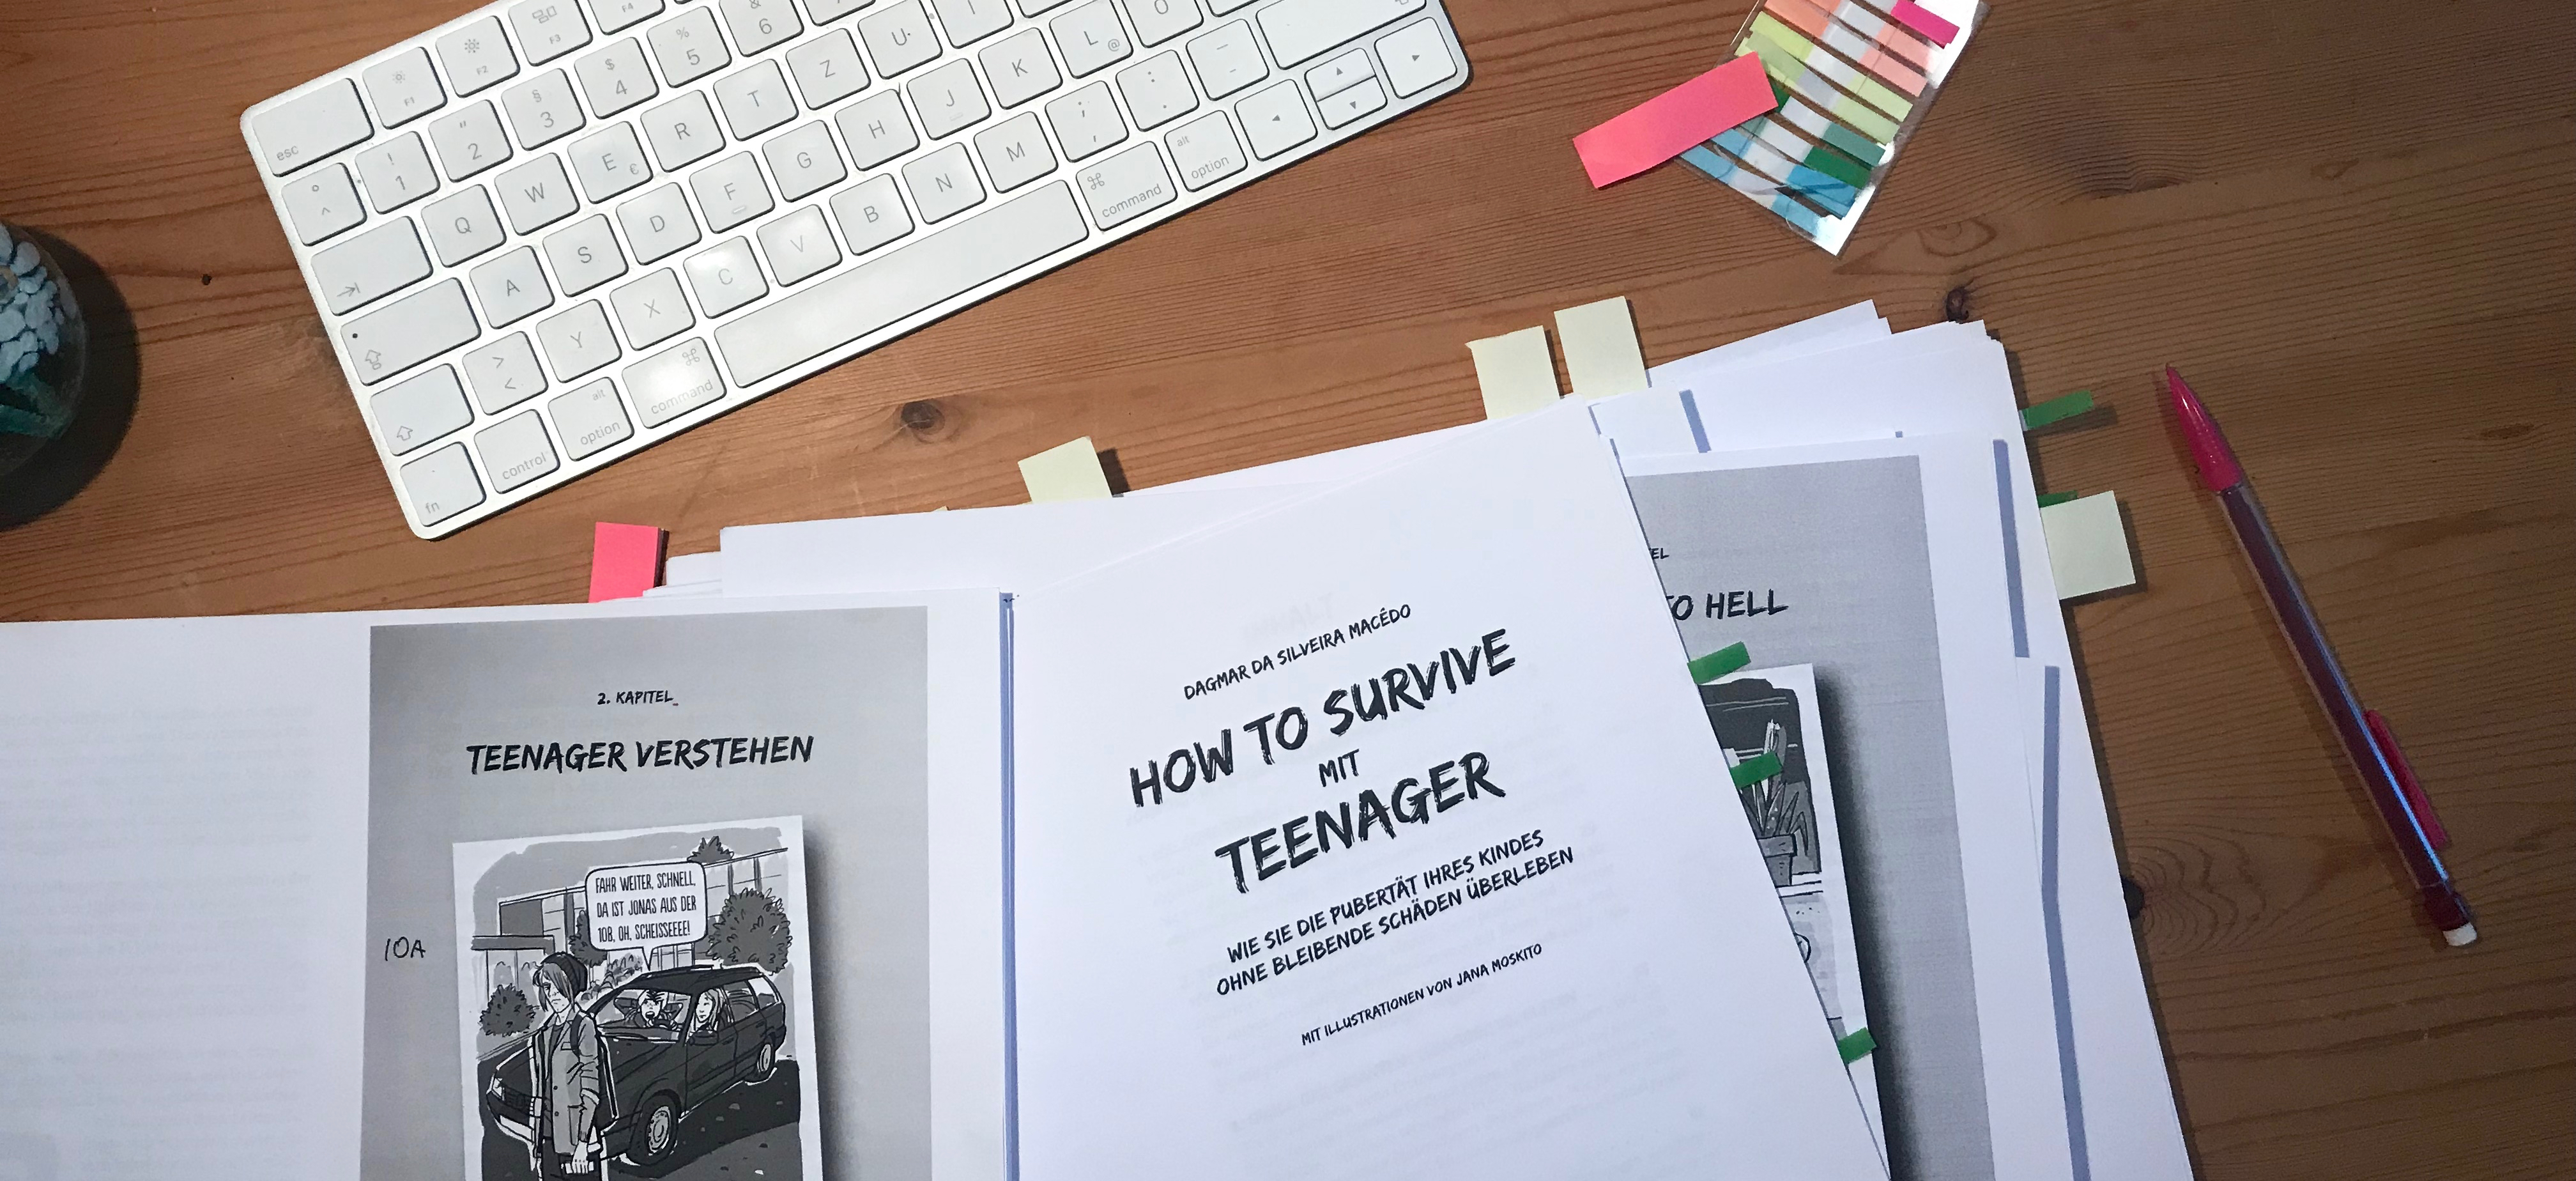 Korrekturen am Manuskript How to survive mit Teenager